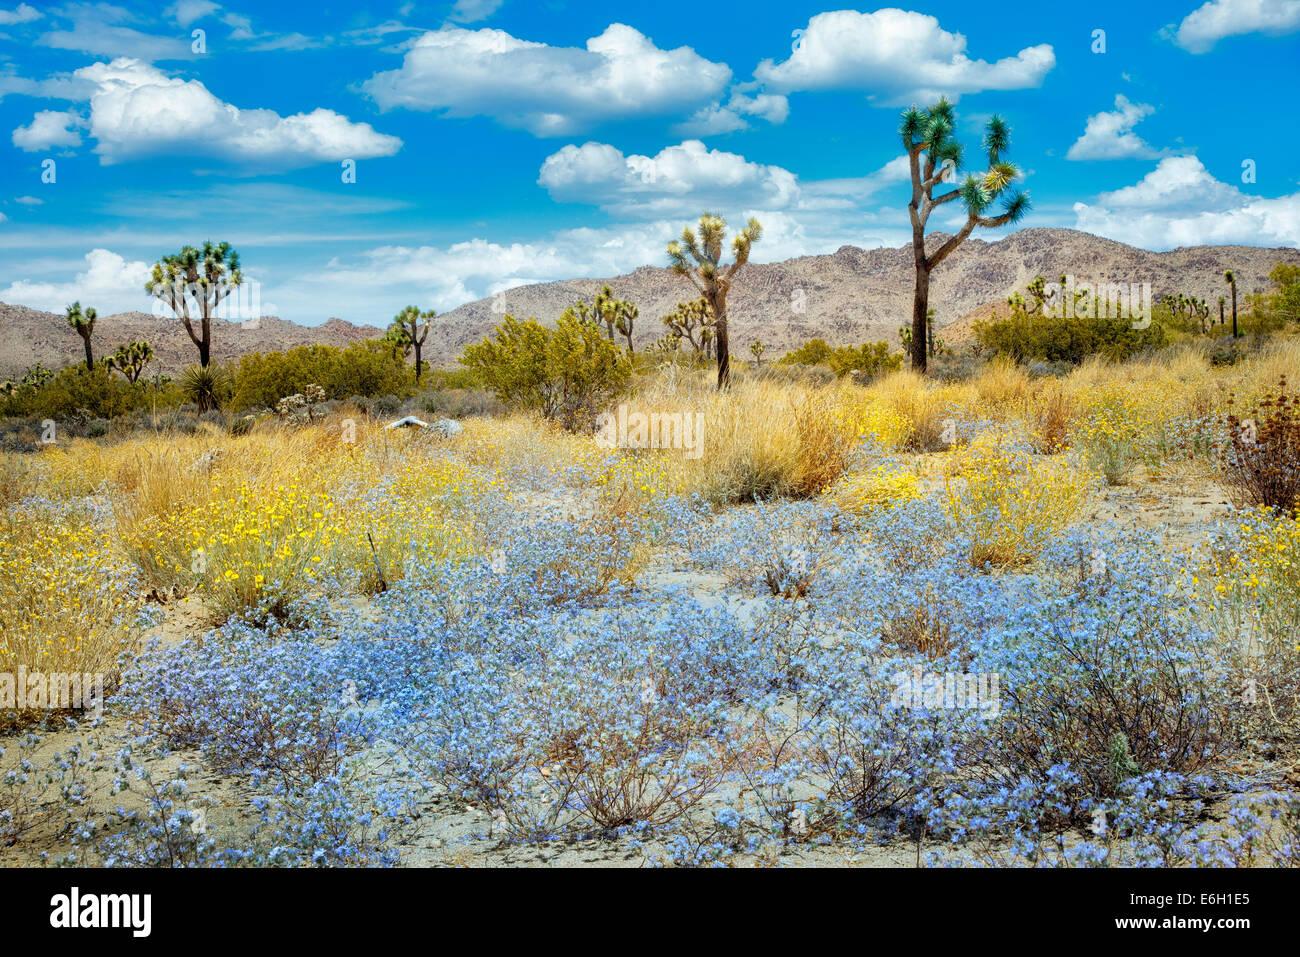 Wildflowers and Joshua Trees. Joshua Tree National Park, California Stock Photo